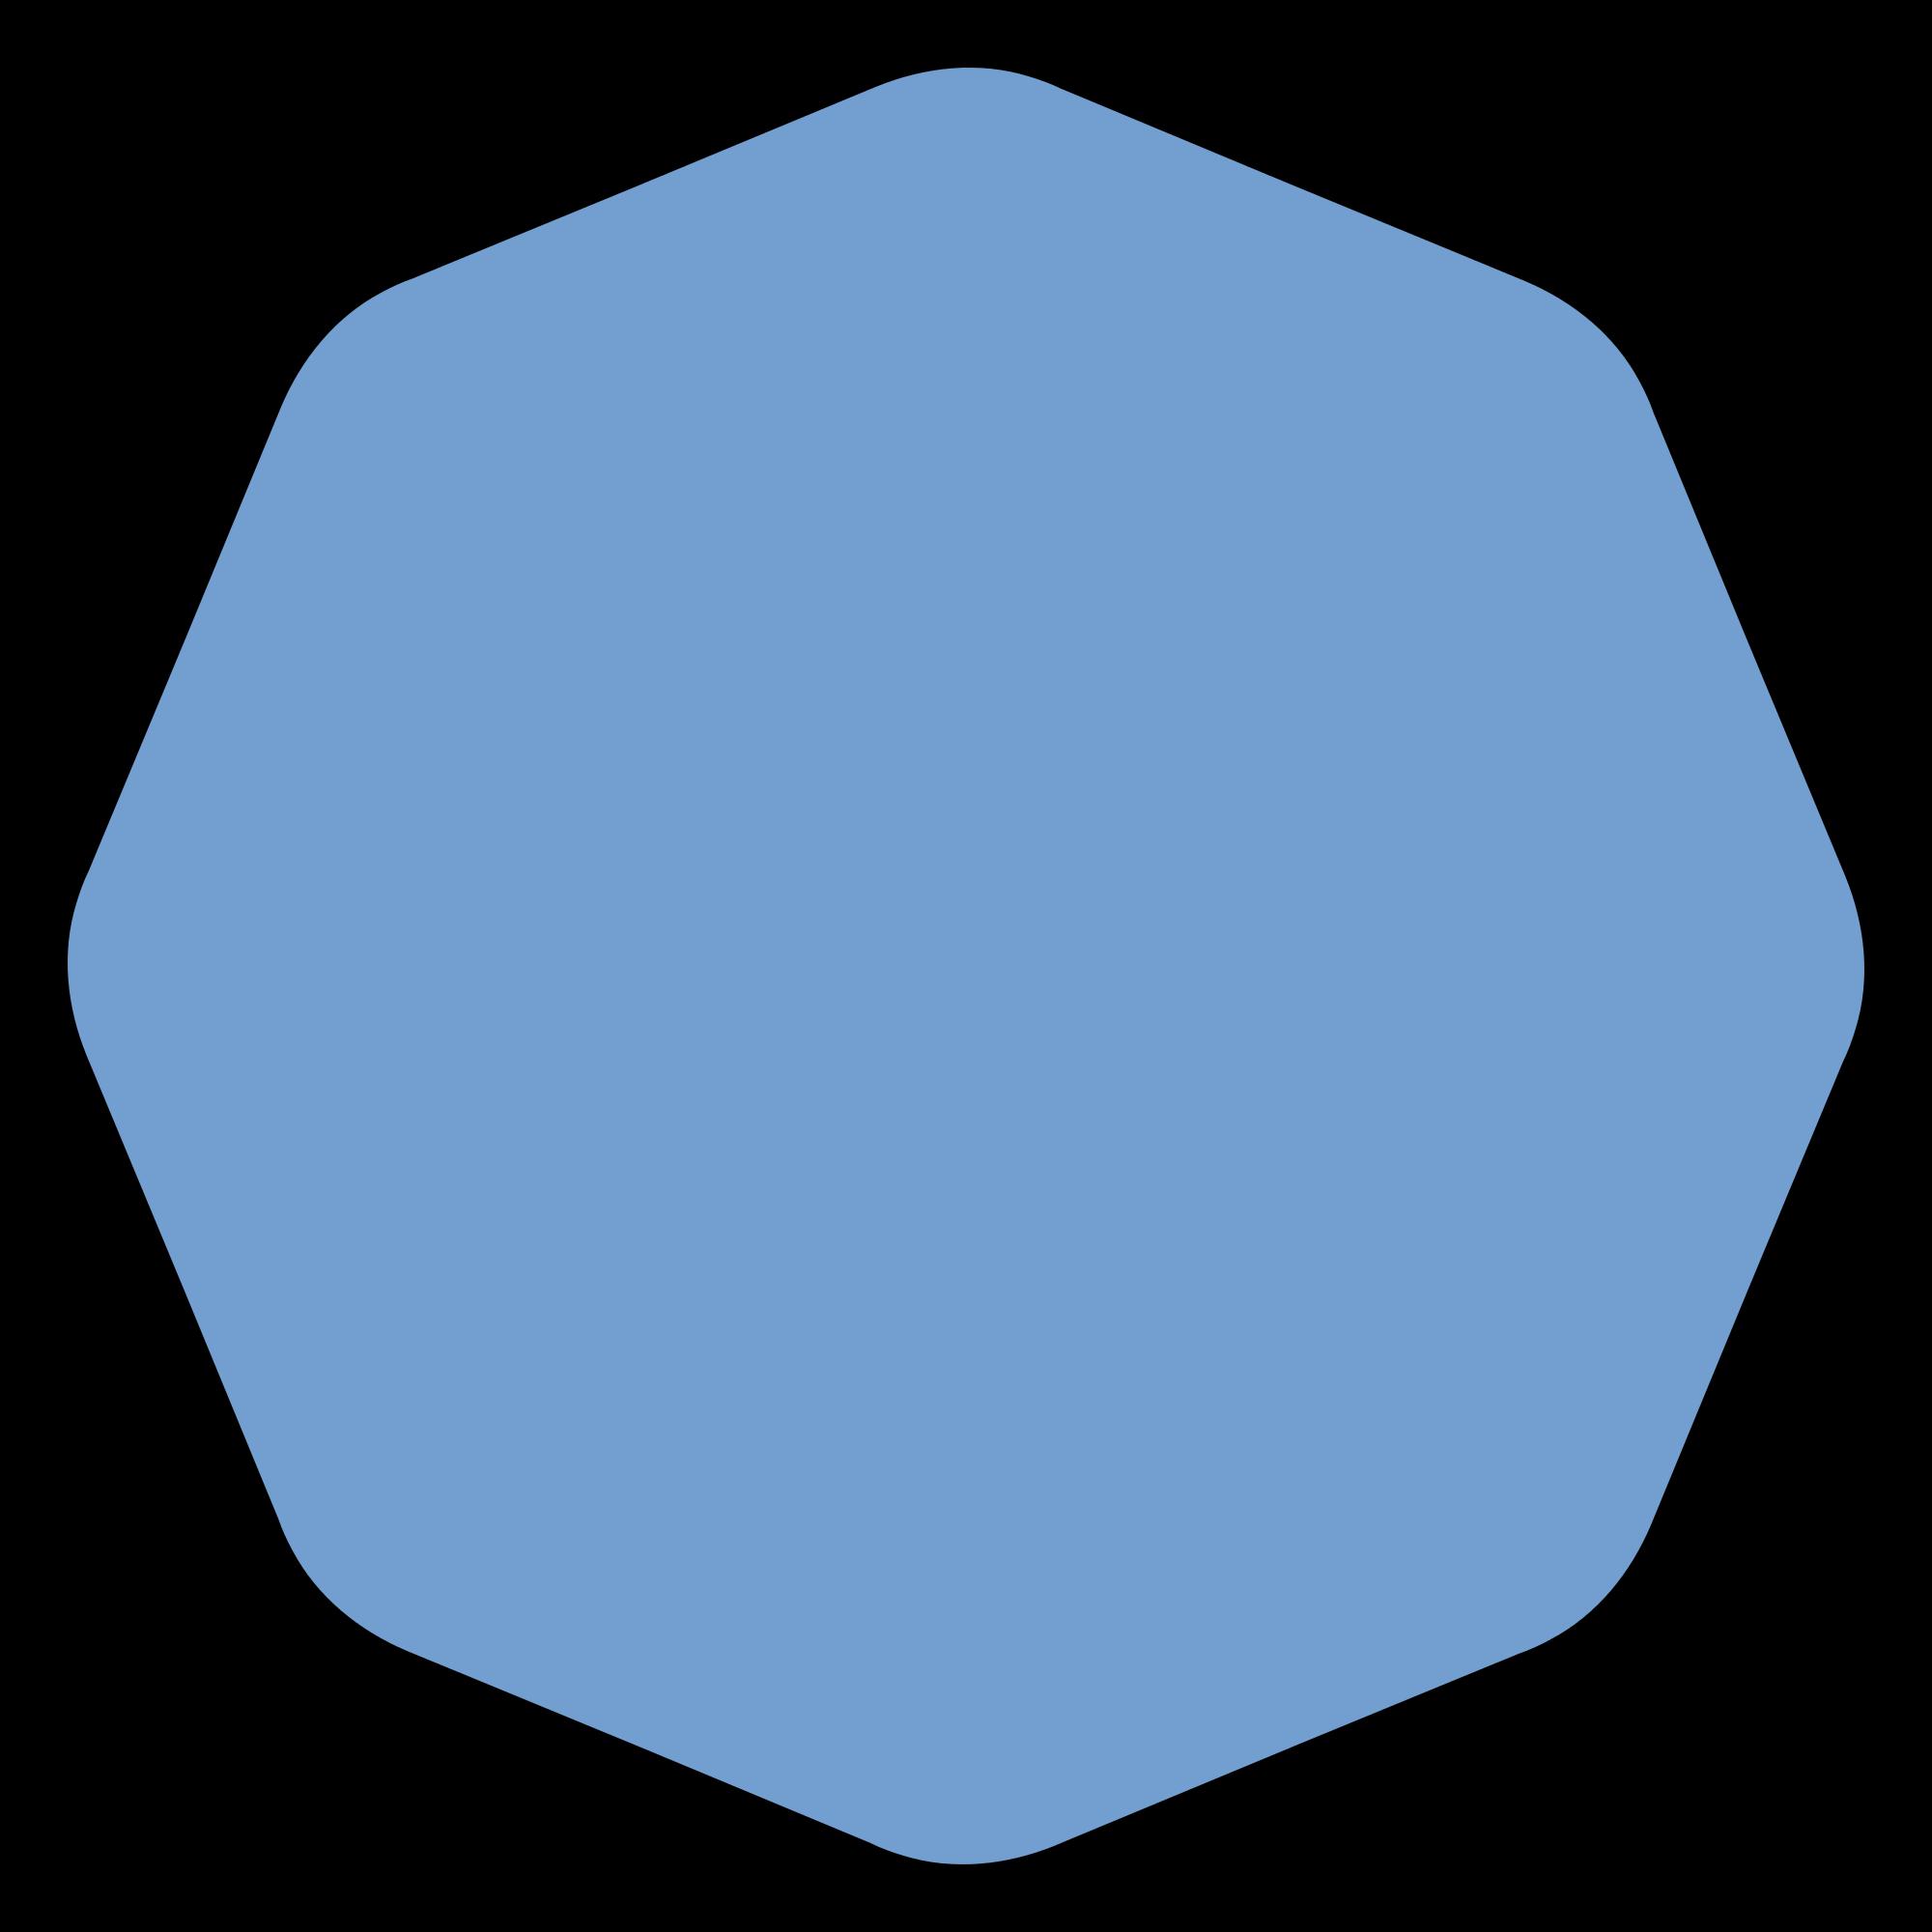 clipart royalty free stock octagon vector logo #114763060